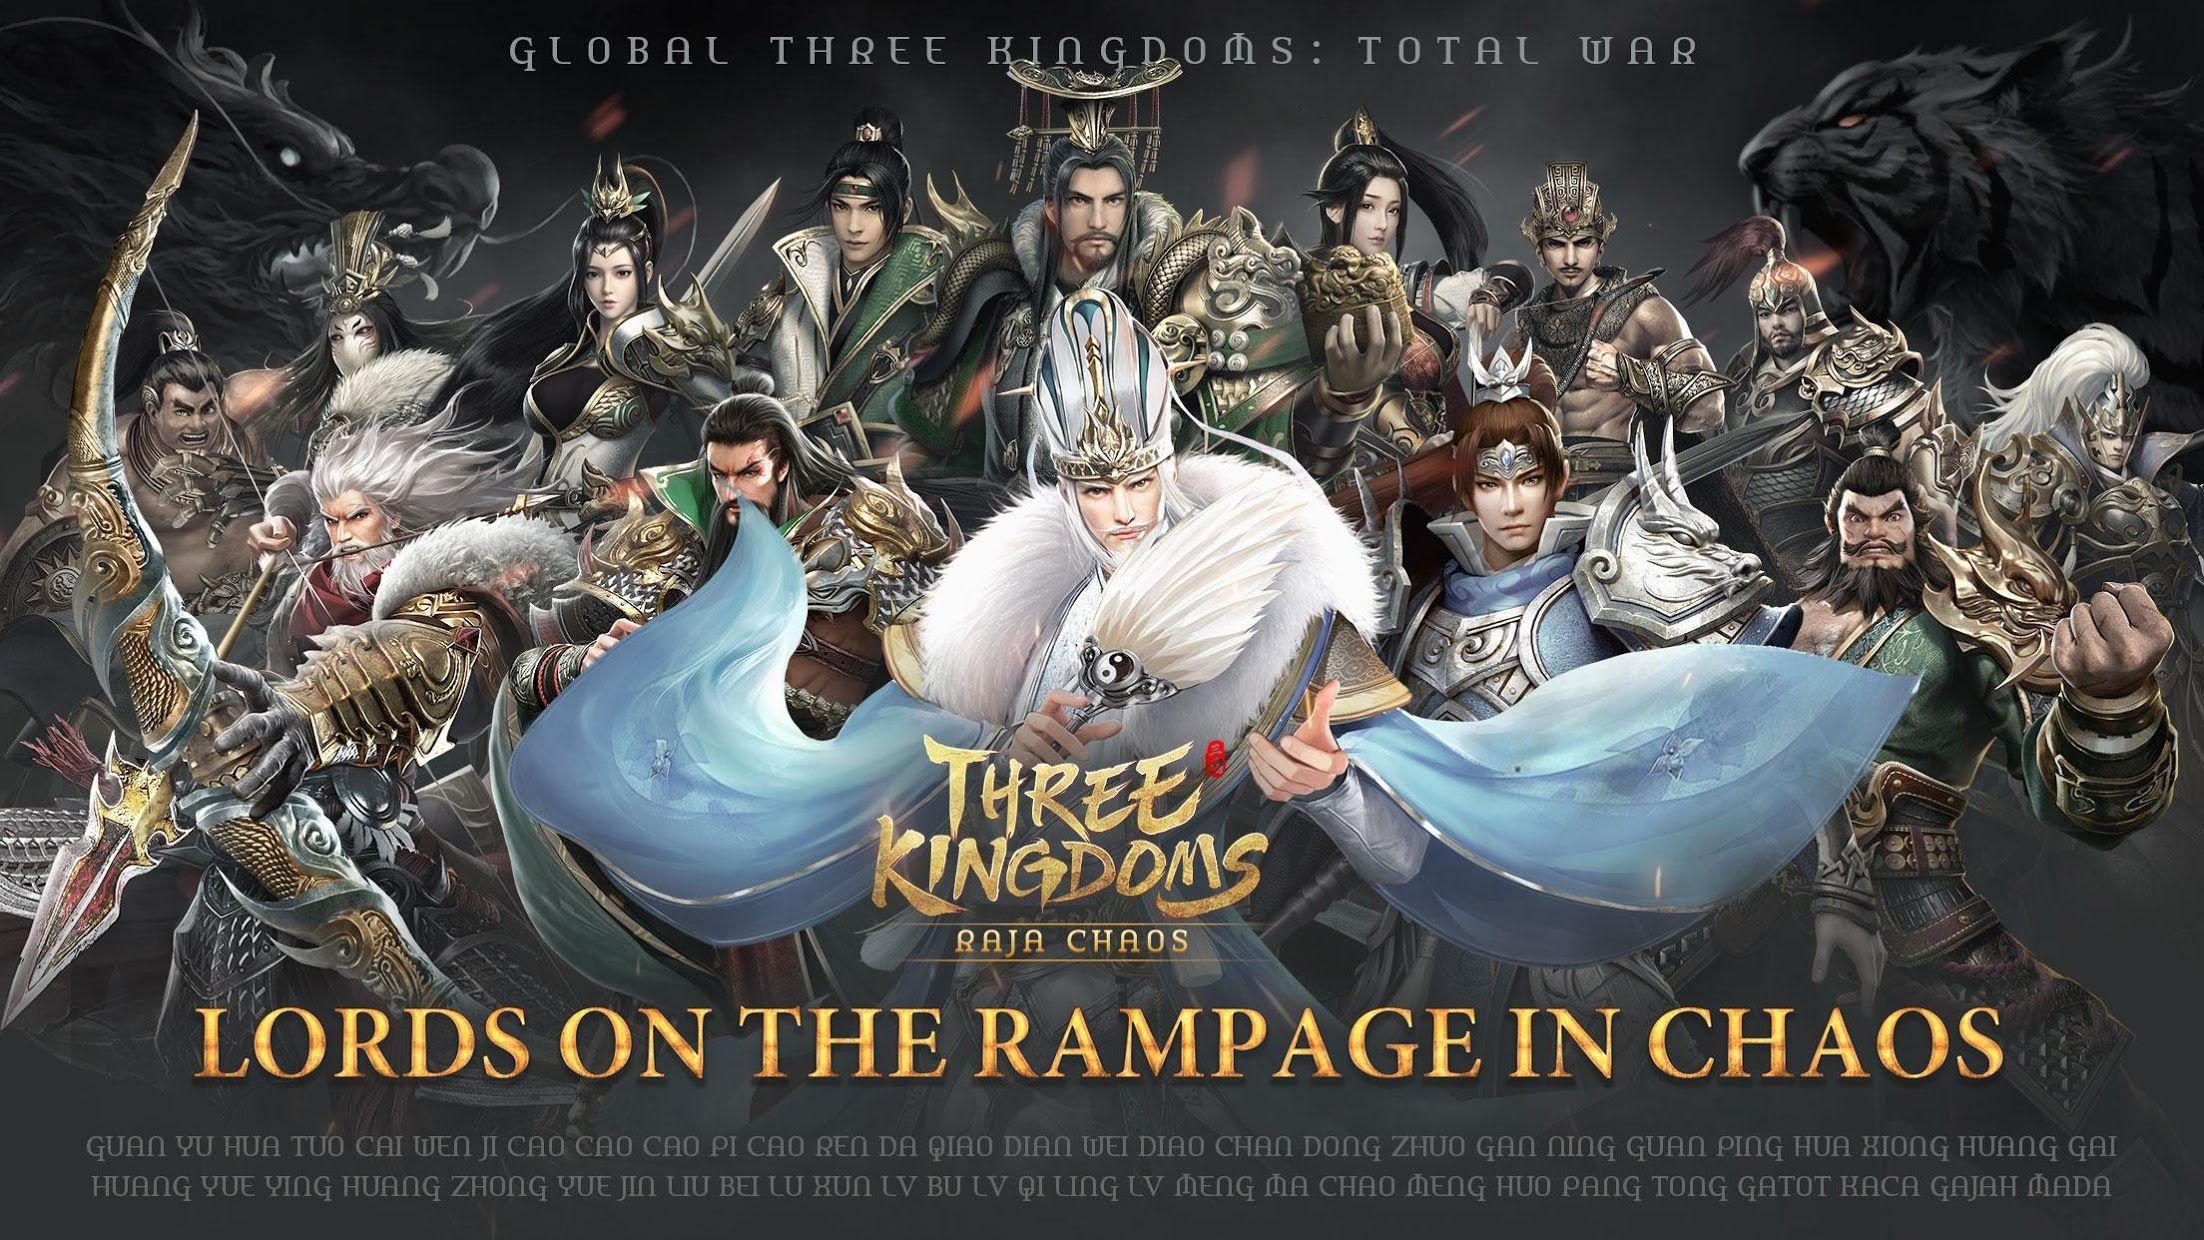 Three Kingdoms: Raja Chaos 游戏截图1